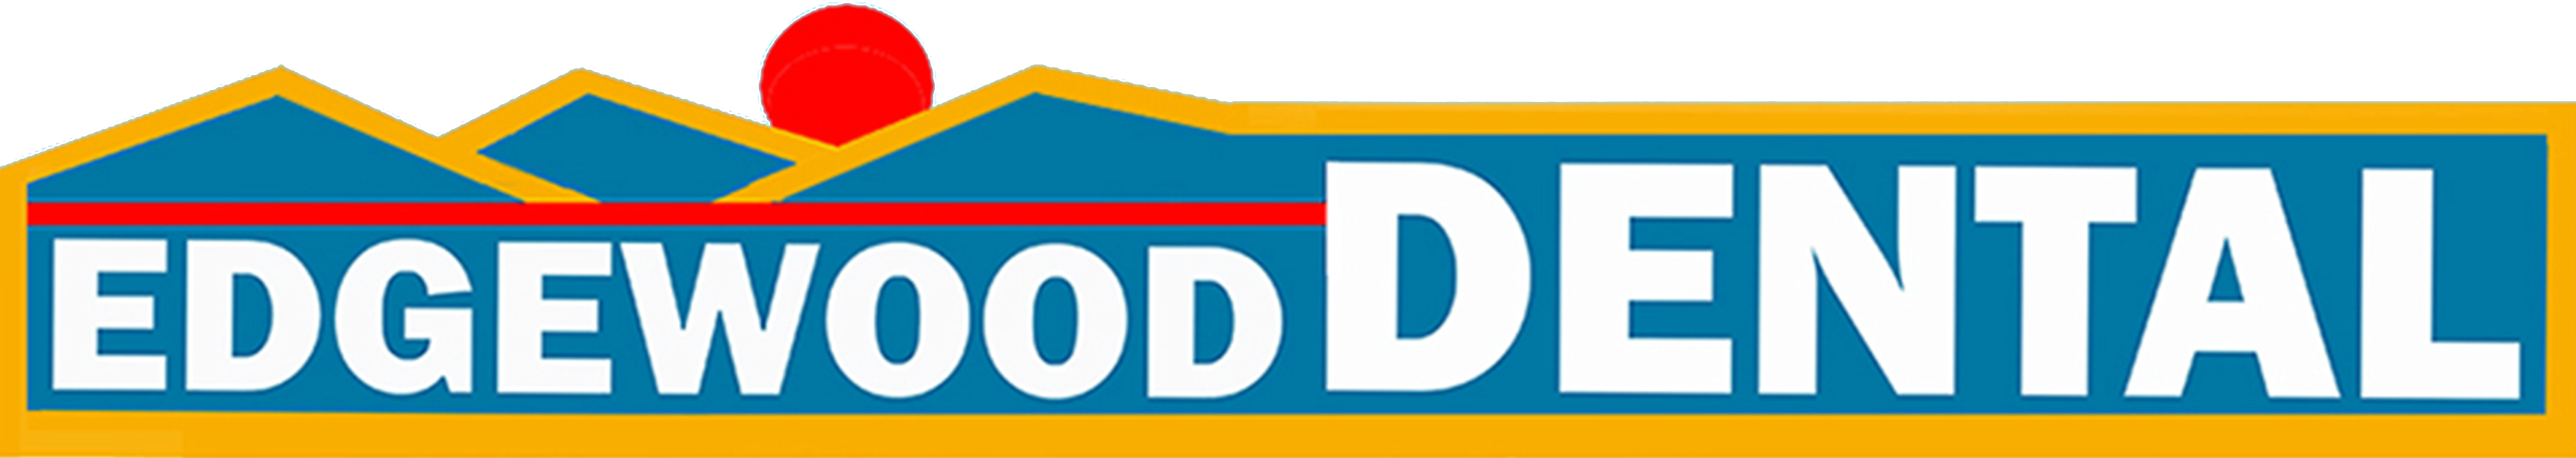 edgewood dentist